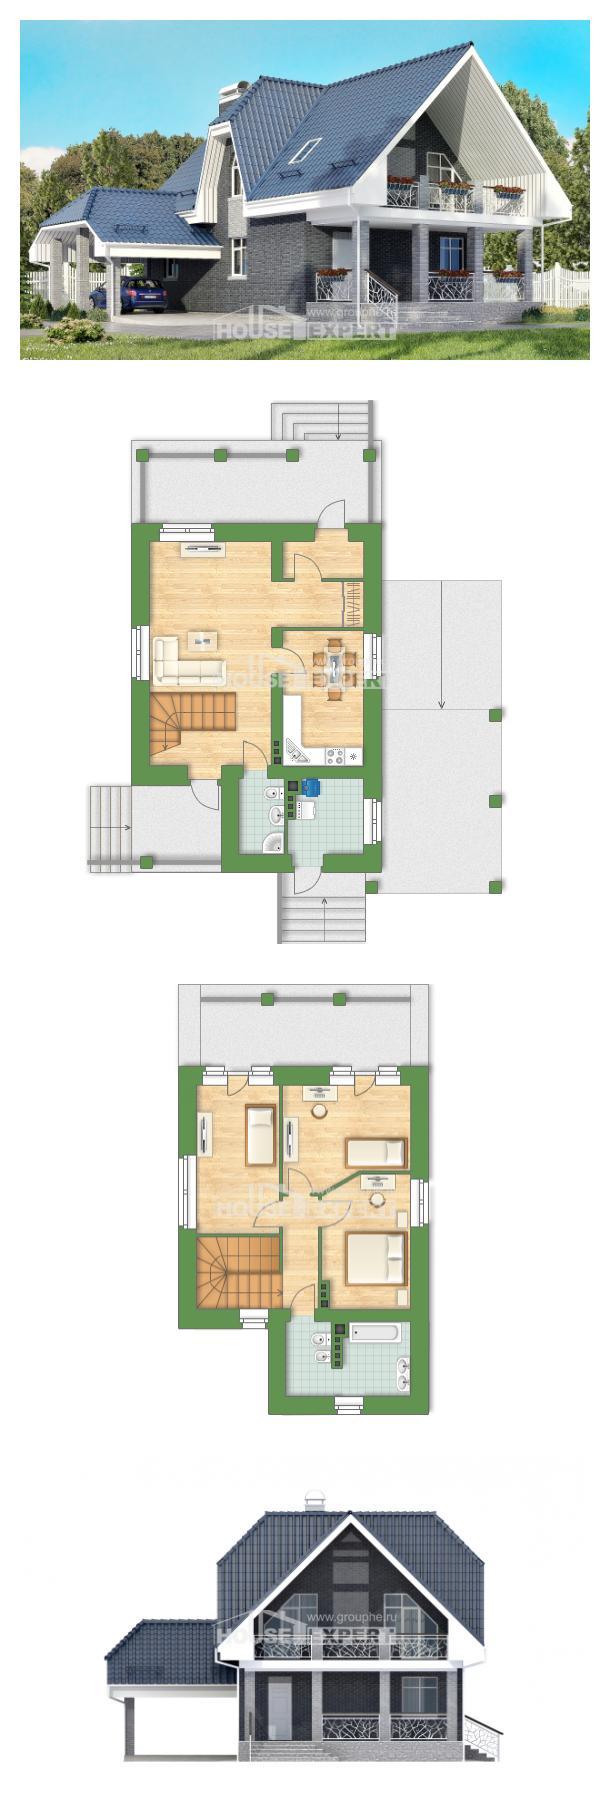 Проект дома 125-002-Л   House Expert